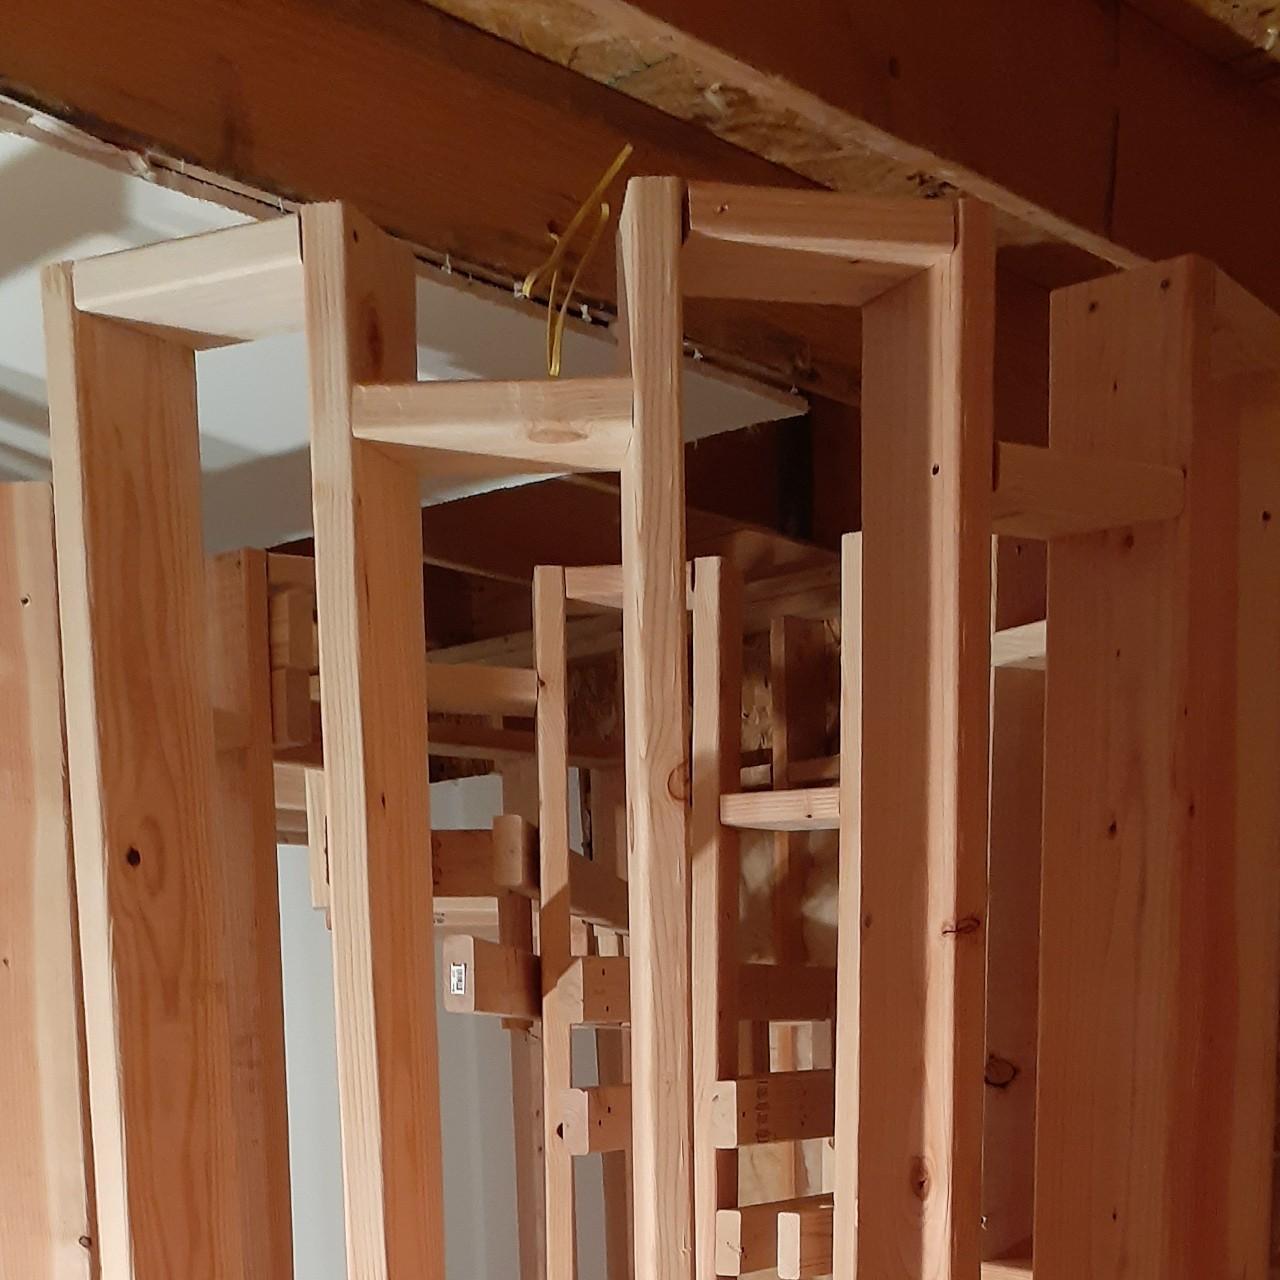 carpentry-wood-framing-second-floor-home-addition--framing-23